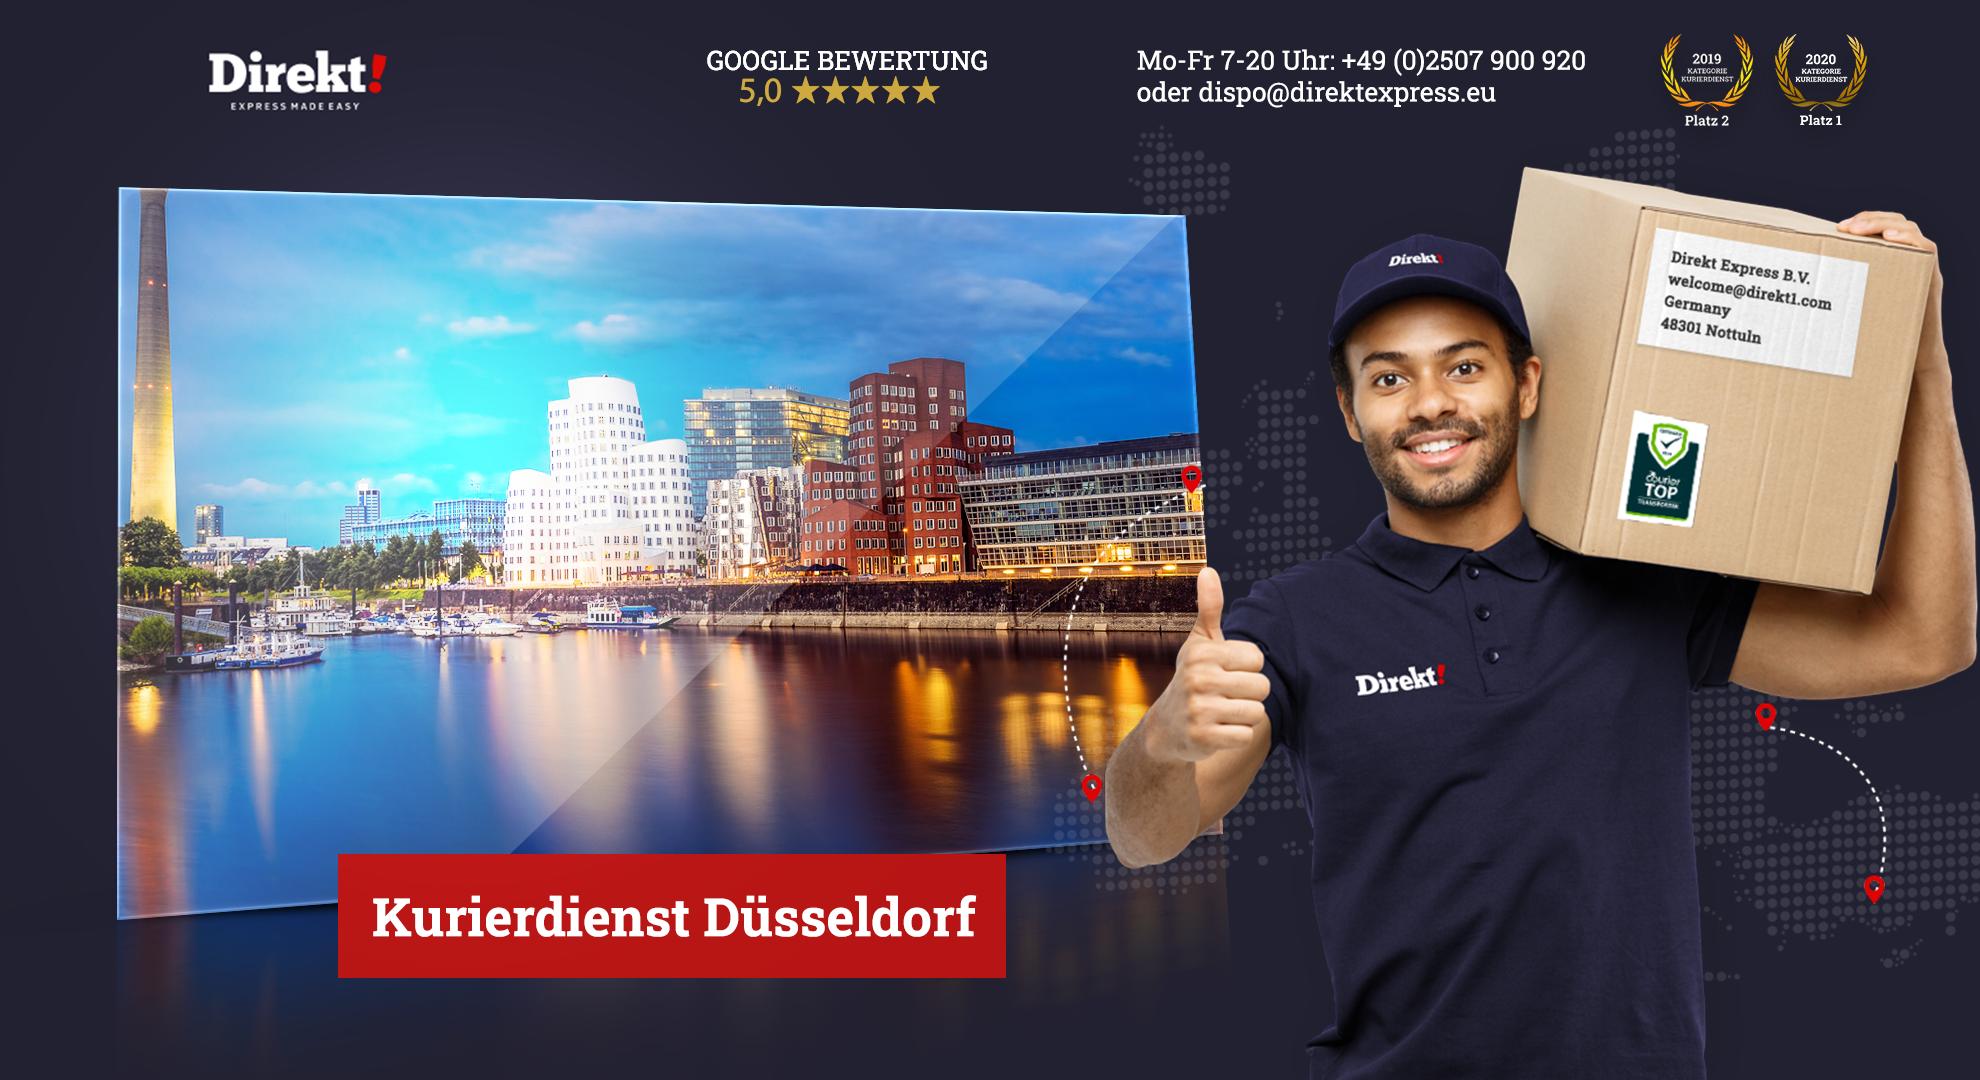 https://direkt1.com/wp-content/uploads/2021/04/Kurierdienst-dusseldorf-buchen.png